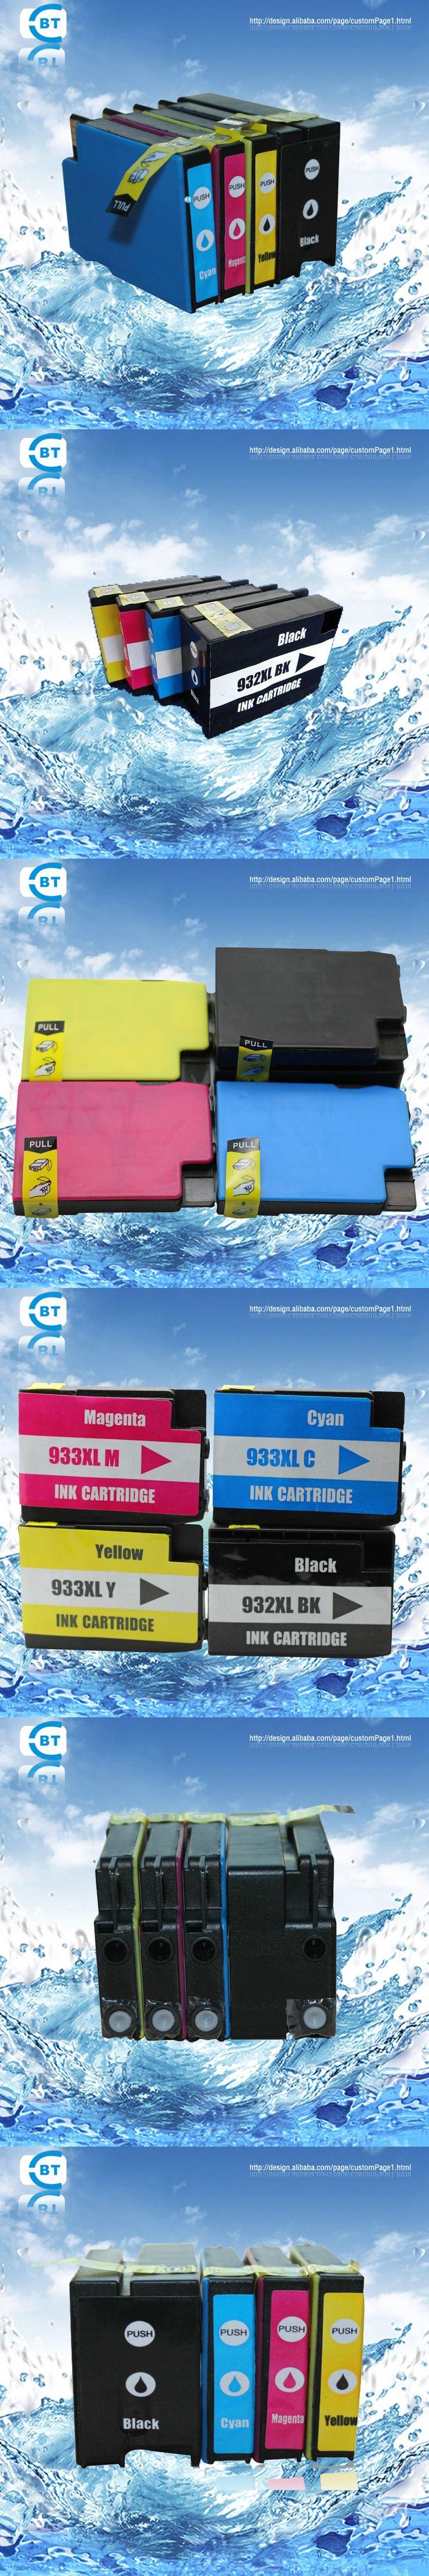 4pcs Compatible hp 932 933 932XL 933XL  ink cartridge for HP Officejet 6100 7610 7510 7512 7110 7612 printer